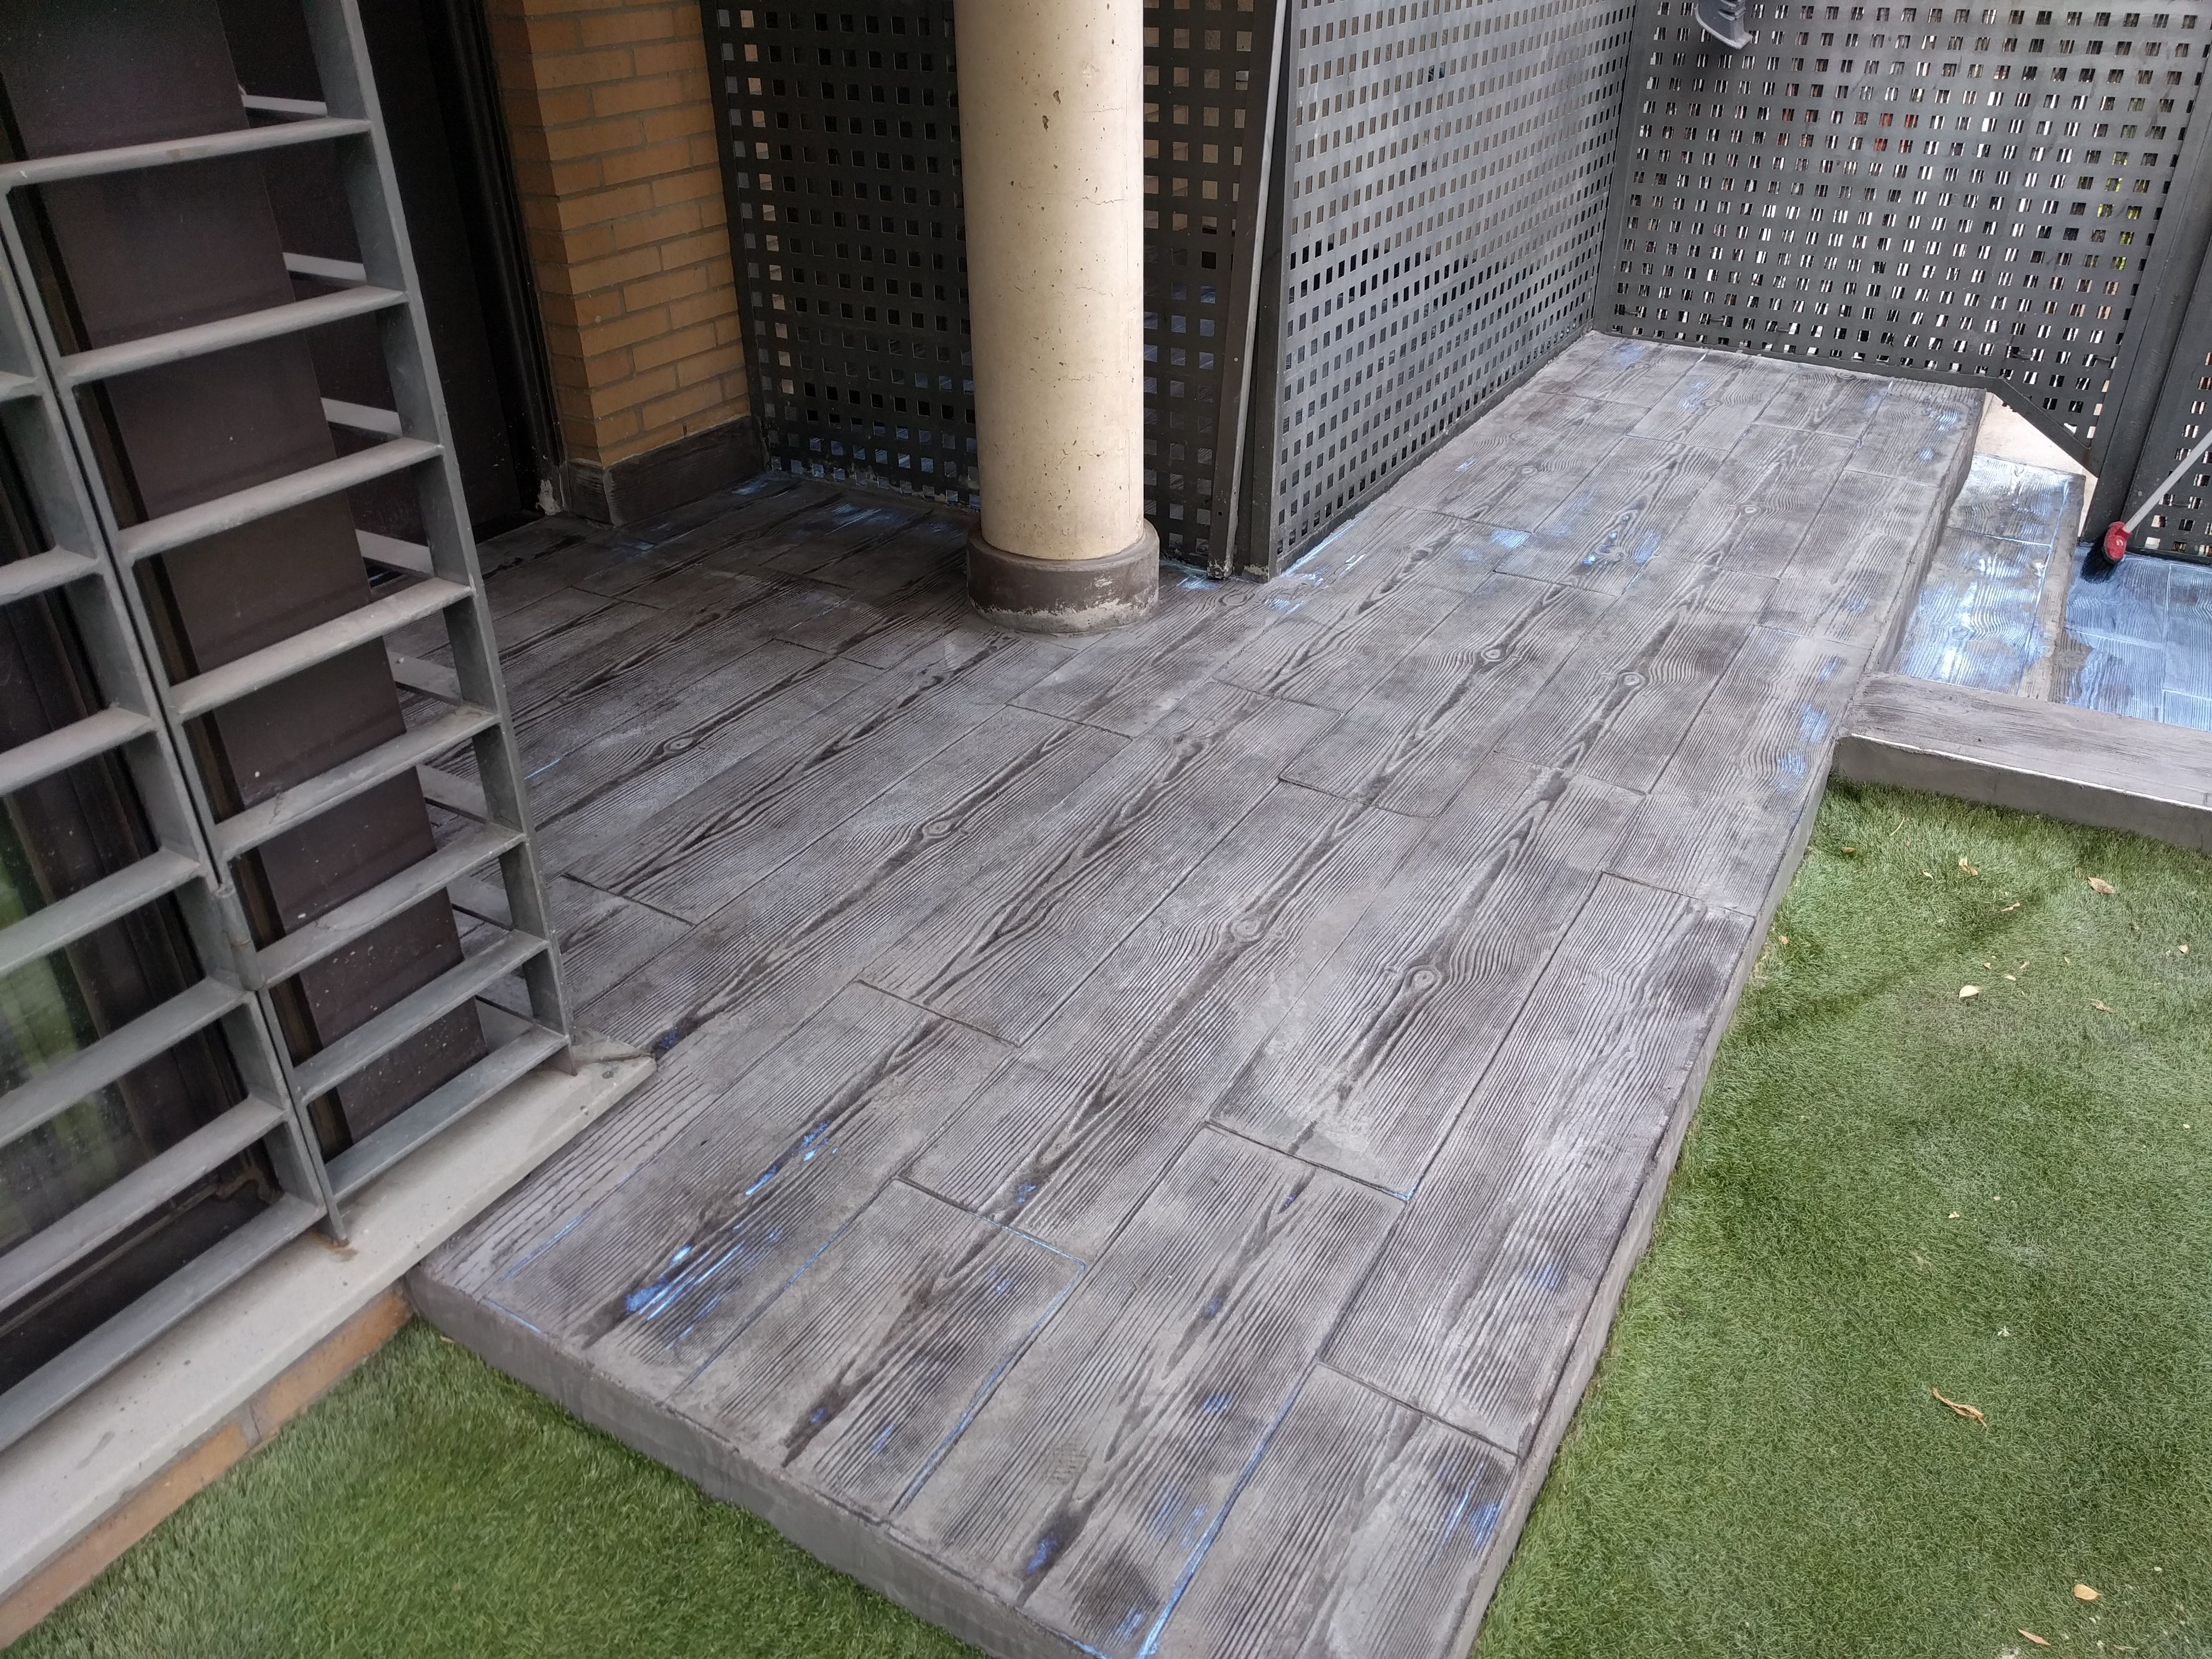 Suelos de exterior imitacion madera fabulous good with suelos de exterior imitacion madera with - Plaquetas suelo exterior ...